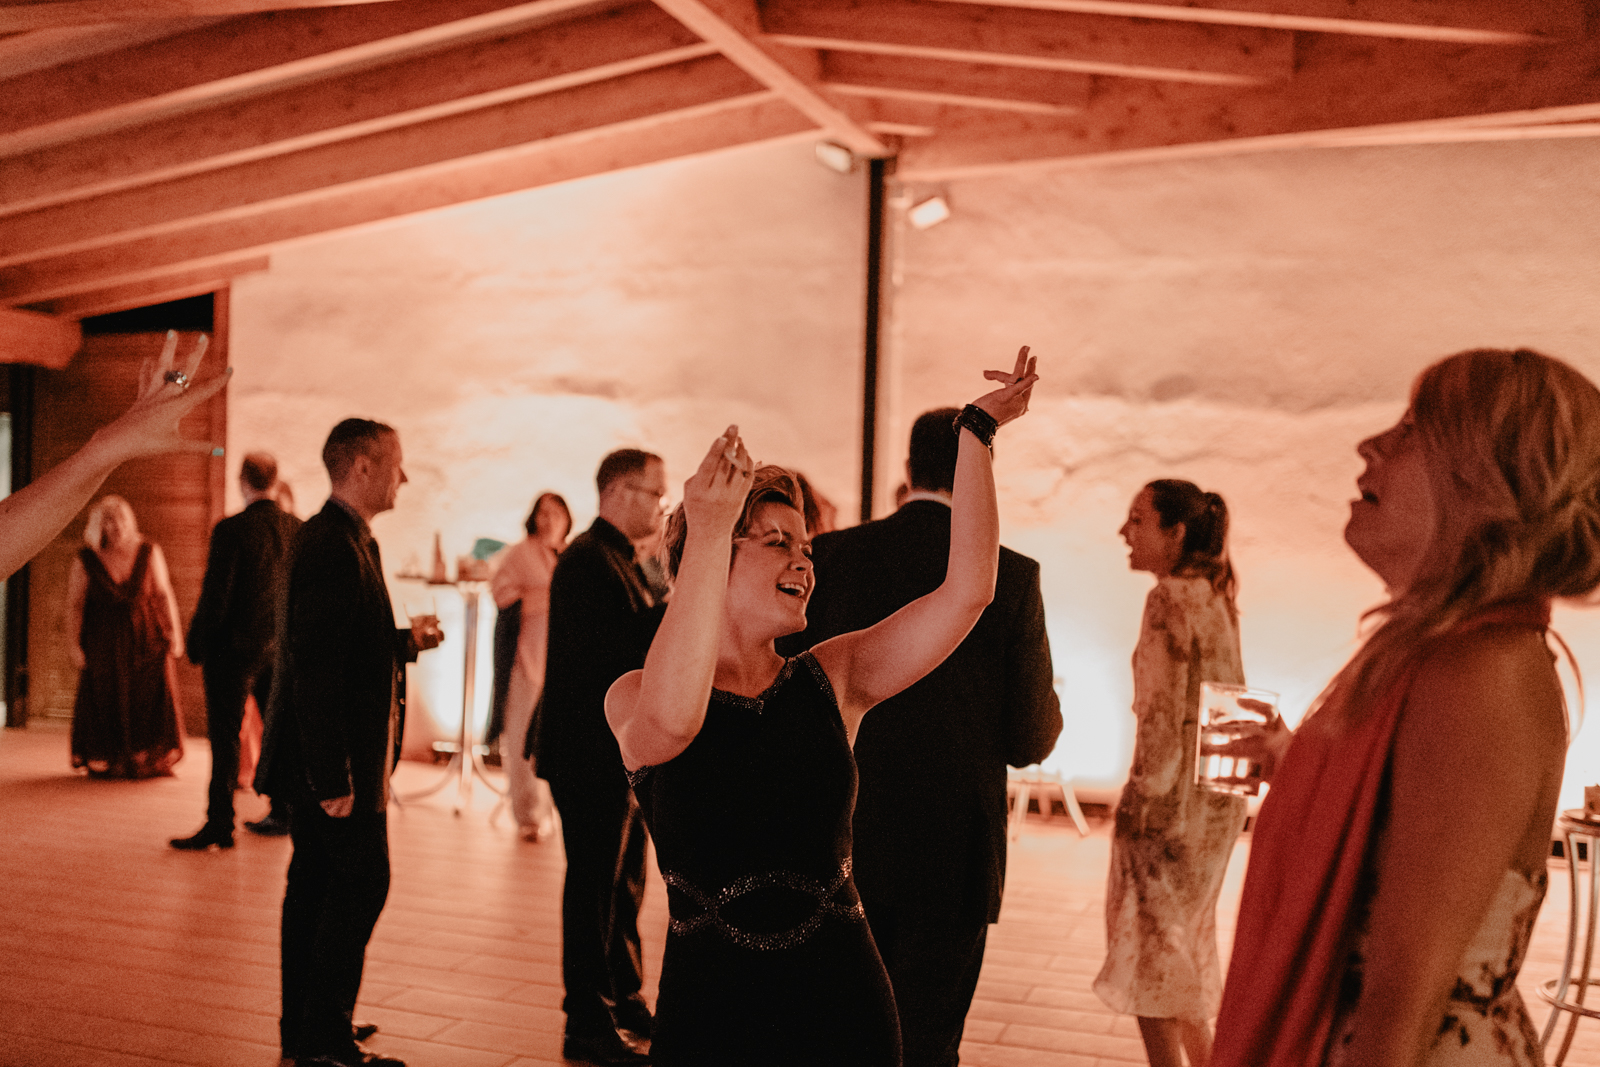 thenortherngirlphotography_photography_thenortherngirl_rebeccascabros_wedding_weddingphotography_weddingphotographer_barcelona_bodaenbarcelona_bodaenmaselmarti_bodarogeryvane-1073.jpg